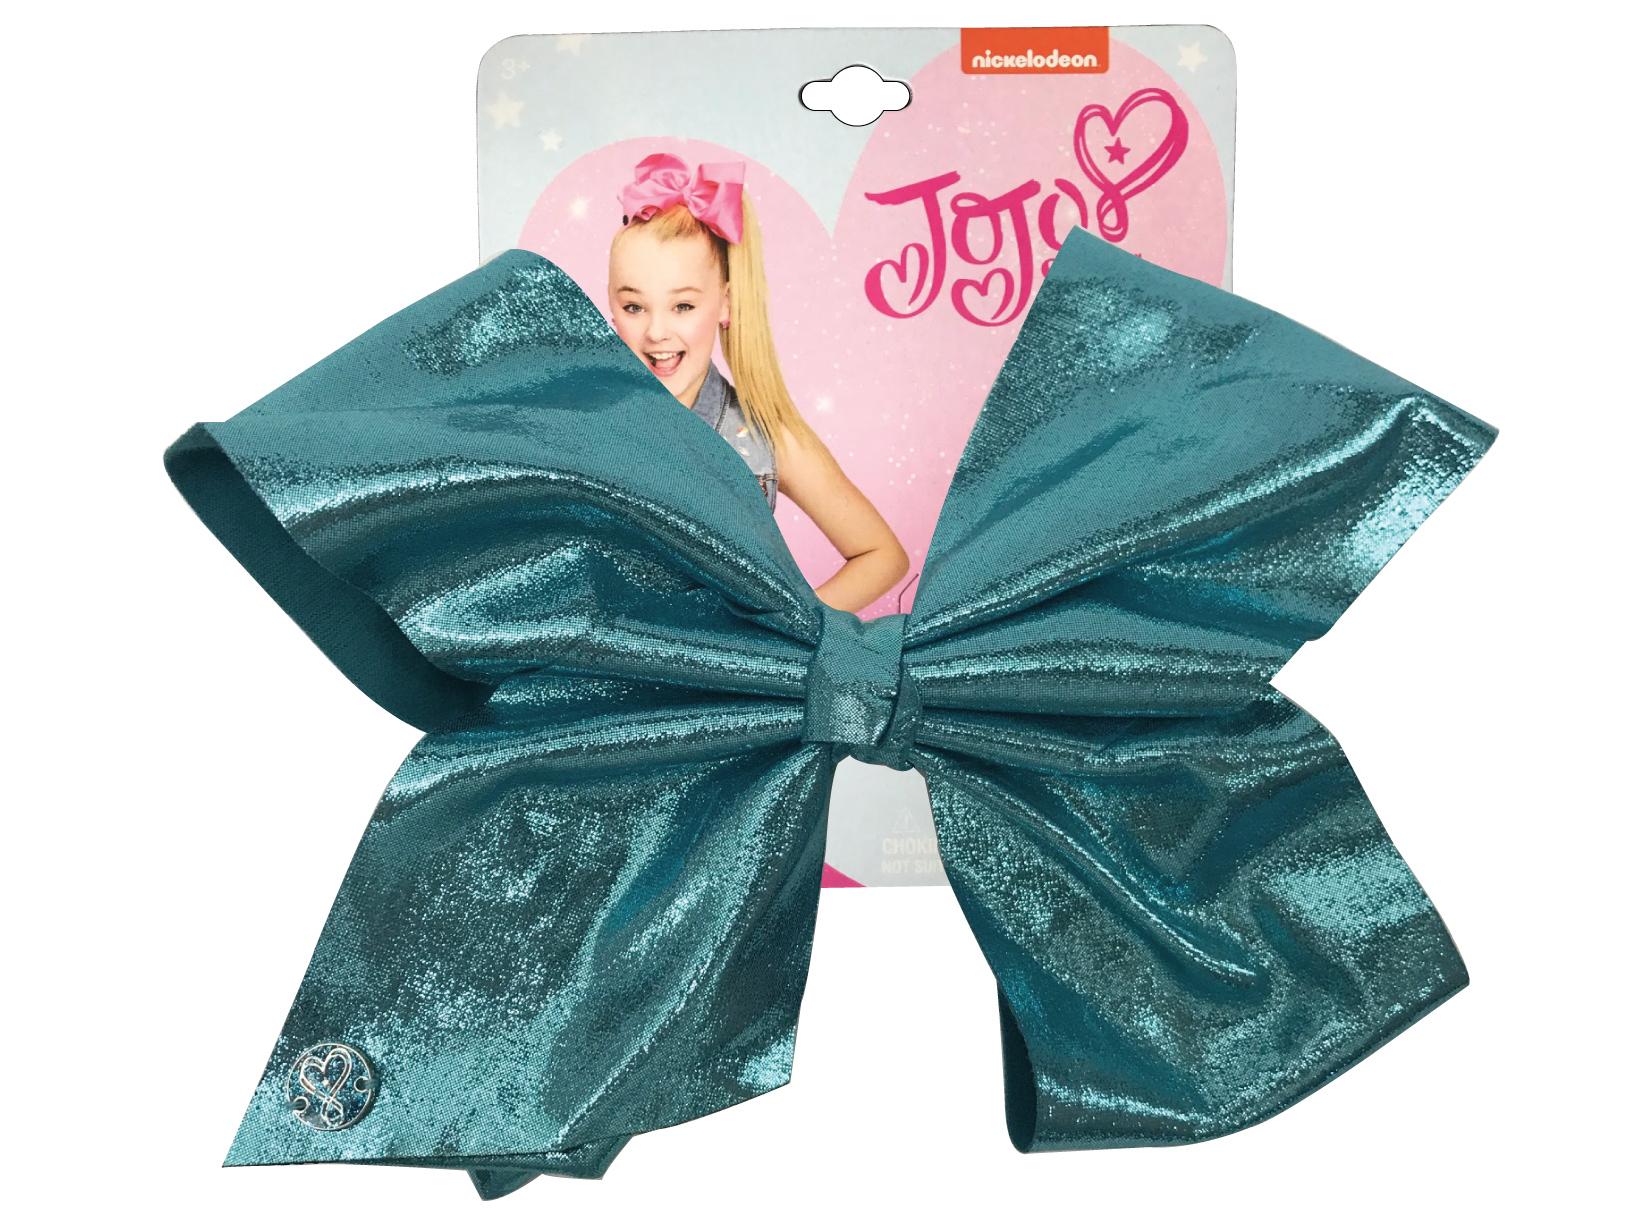 JoJo Siwa Large Cheer Hair Bow (Turquoise Glitter)